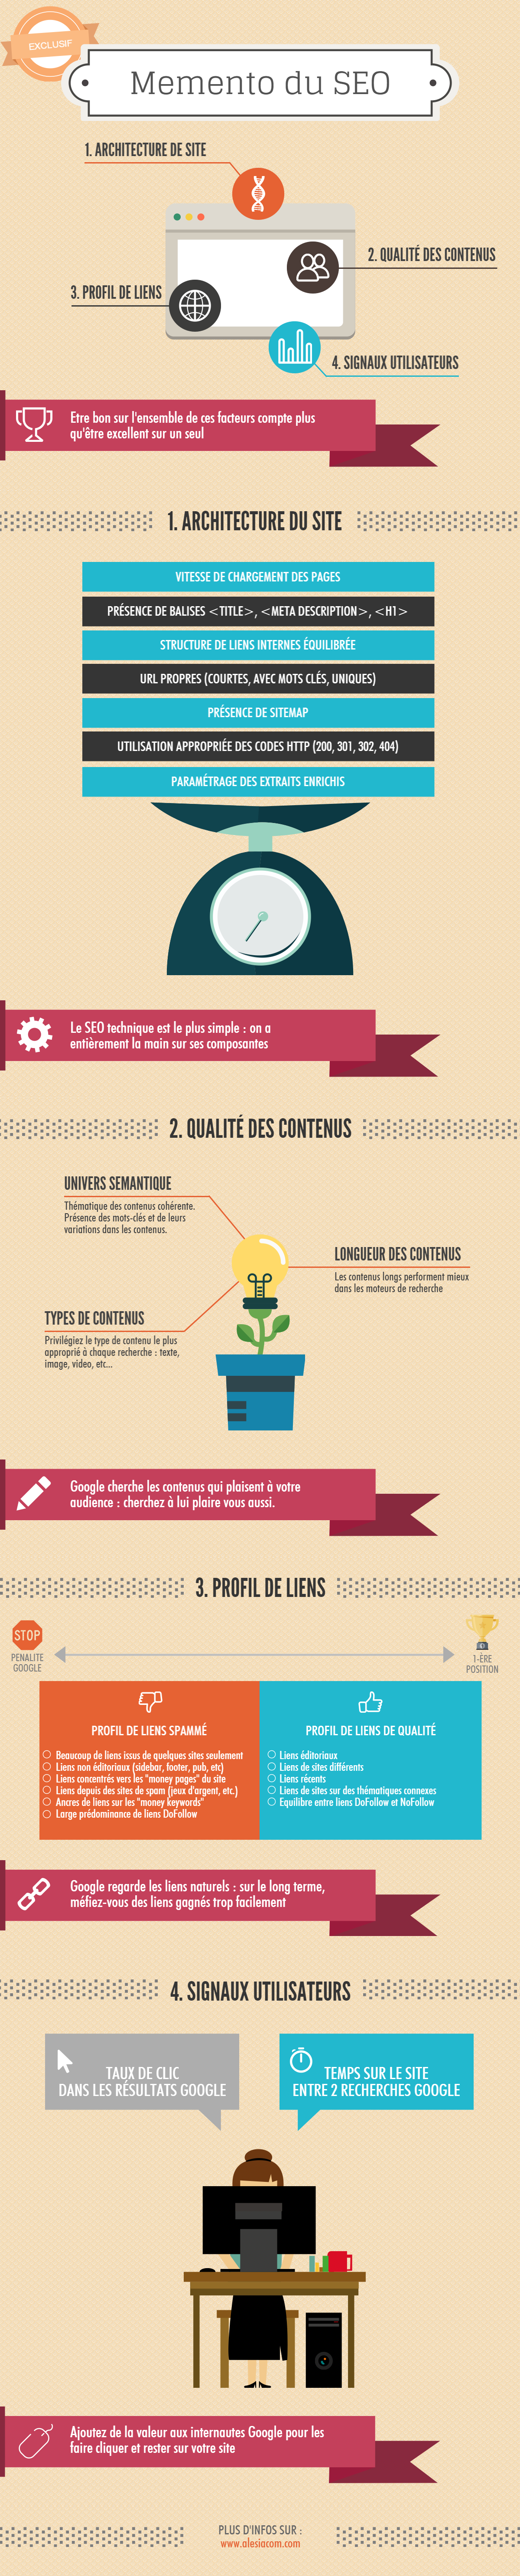 Infographie : memento du SEO